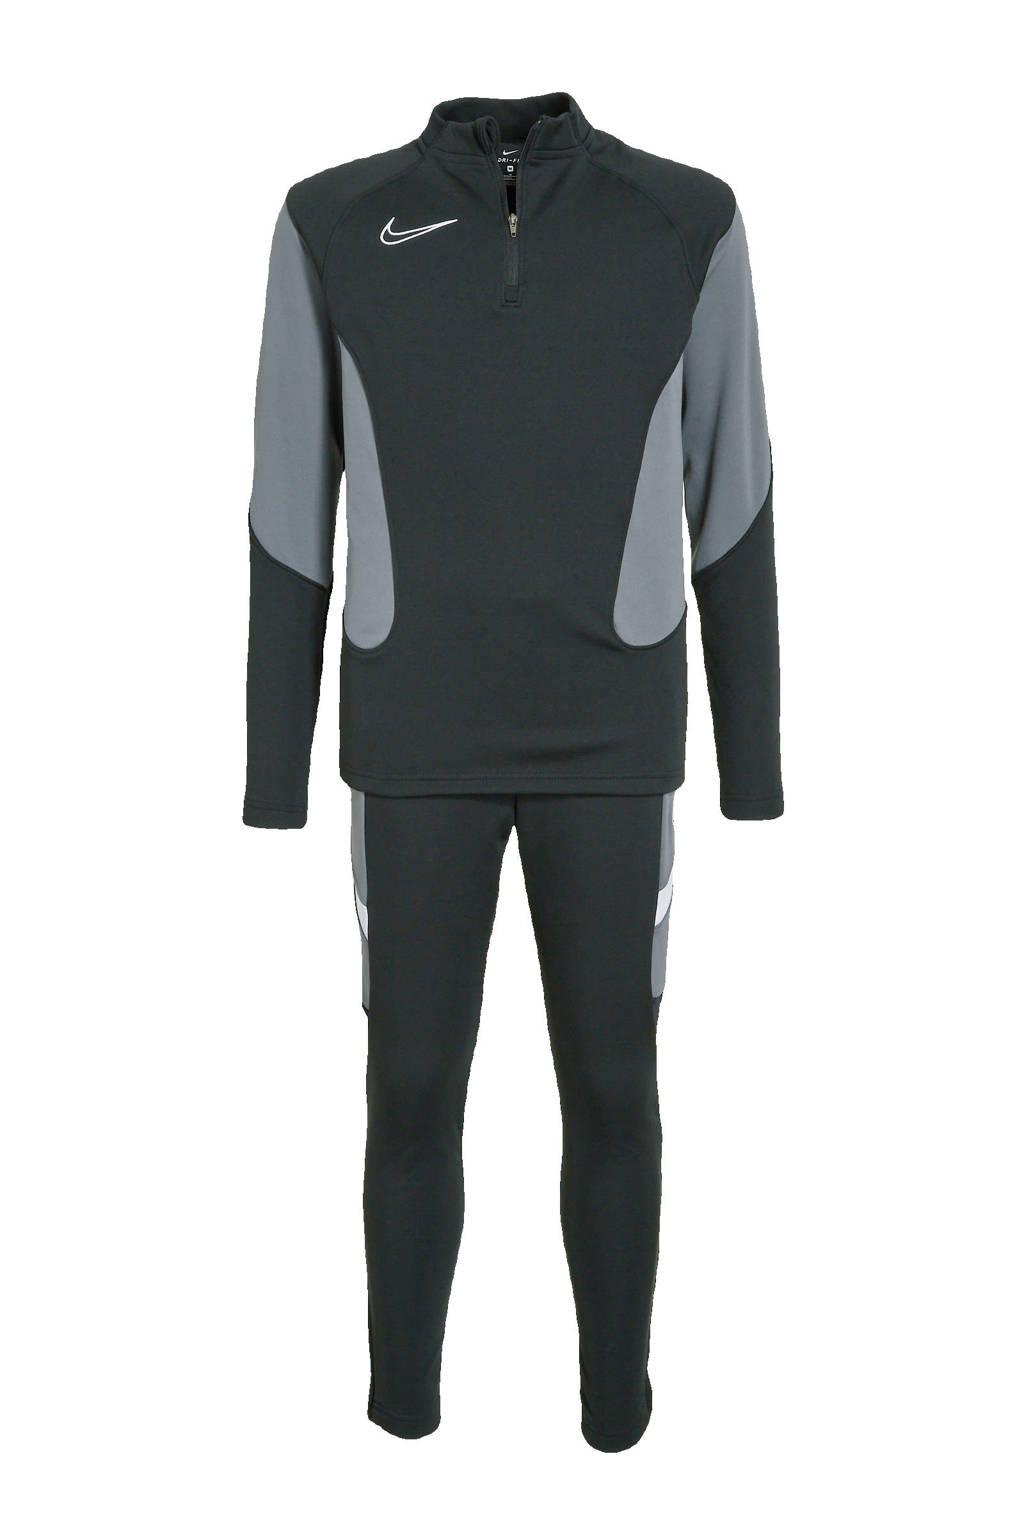 Nike Junior  trainingspak zwart/grijs, Zwart/grijs